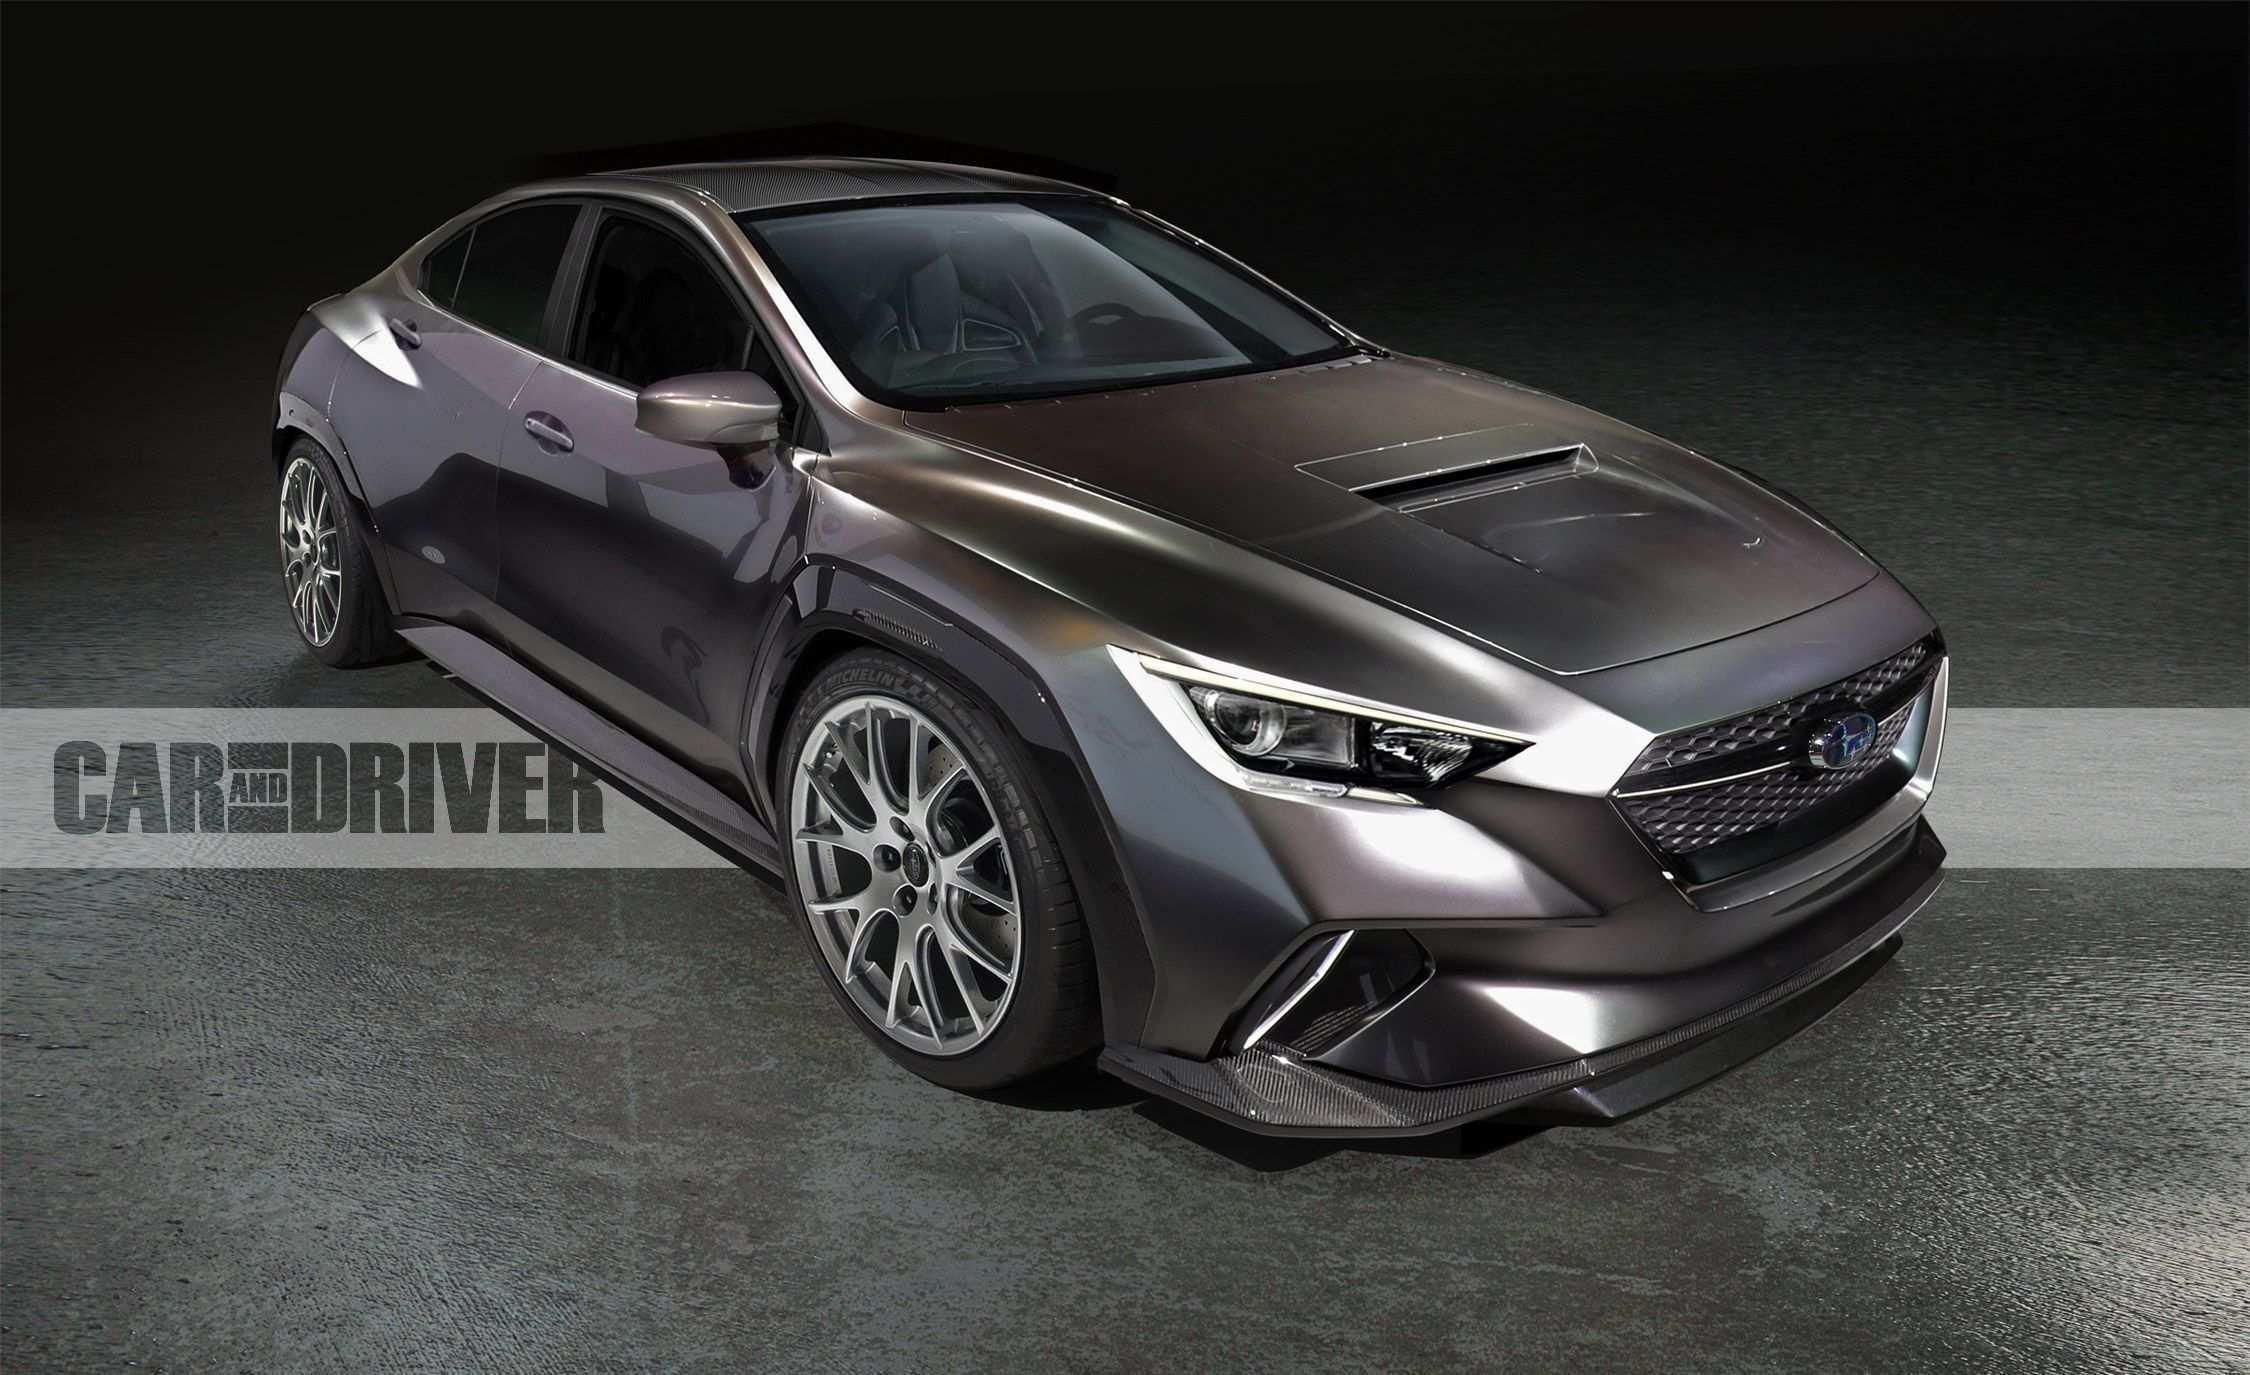 77 The 2020 Subaru Wrx Sti Release Date Specs and Review for 2020 Subaru Wrx Sti Release Date